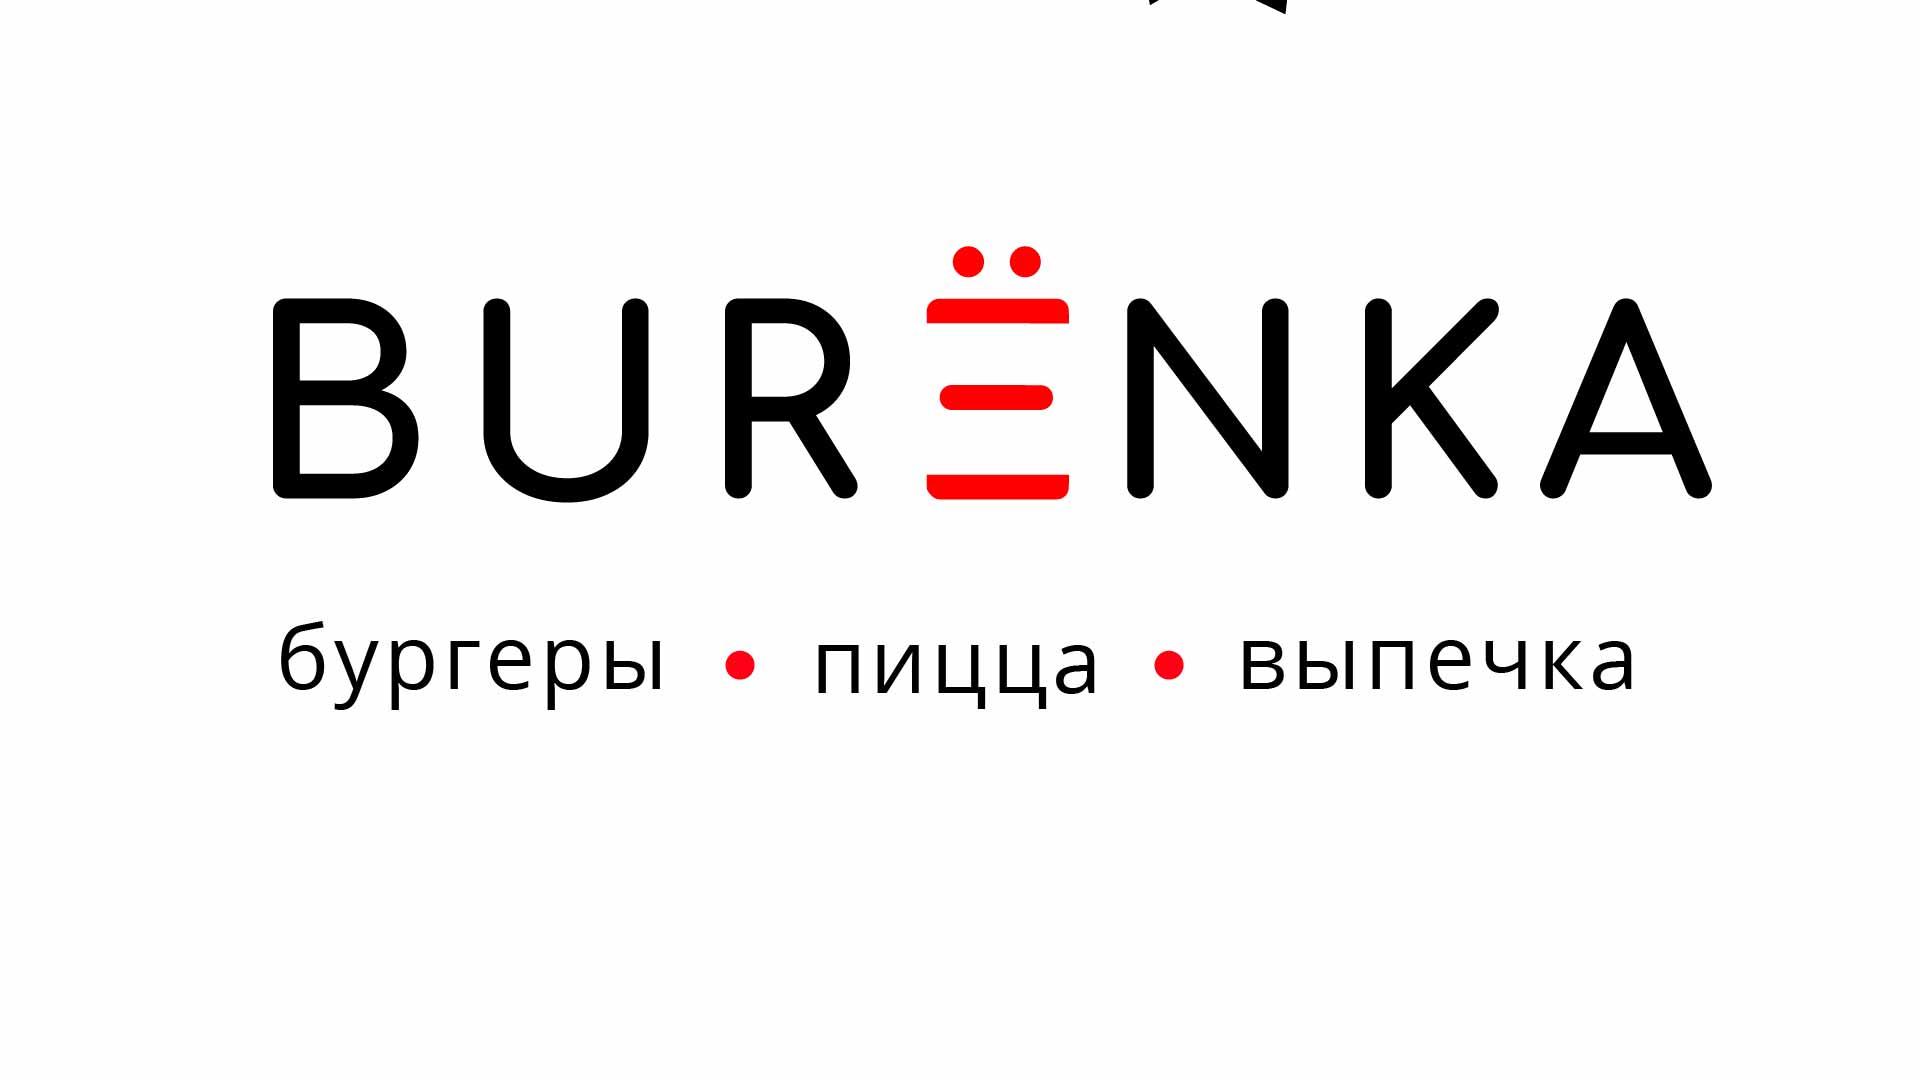 Логотип для Бургерной с Пекарней фото f_8025e125f1537649.jpg